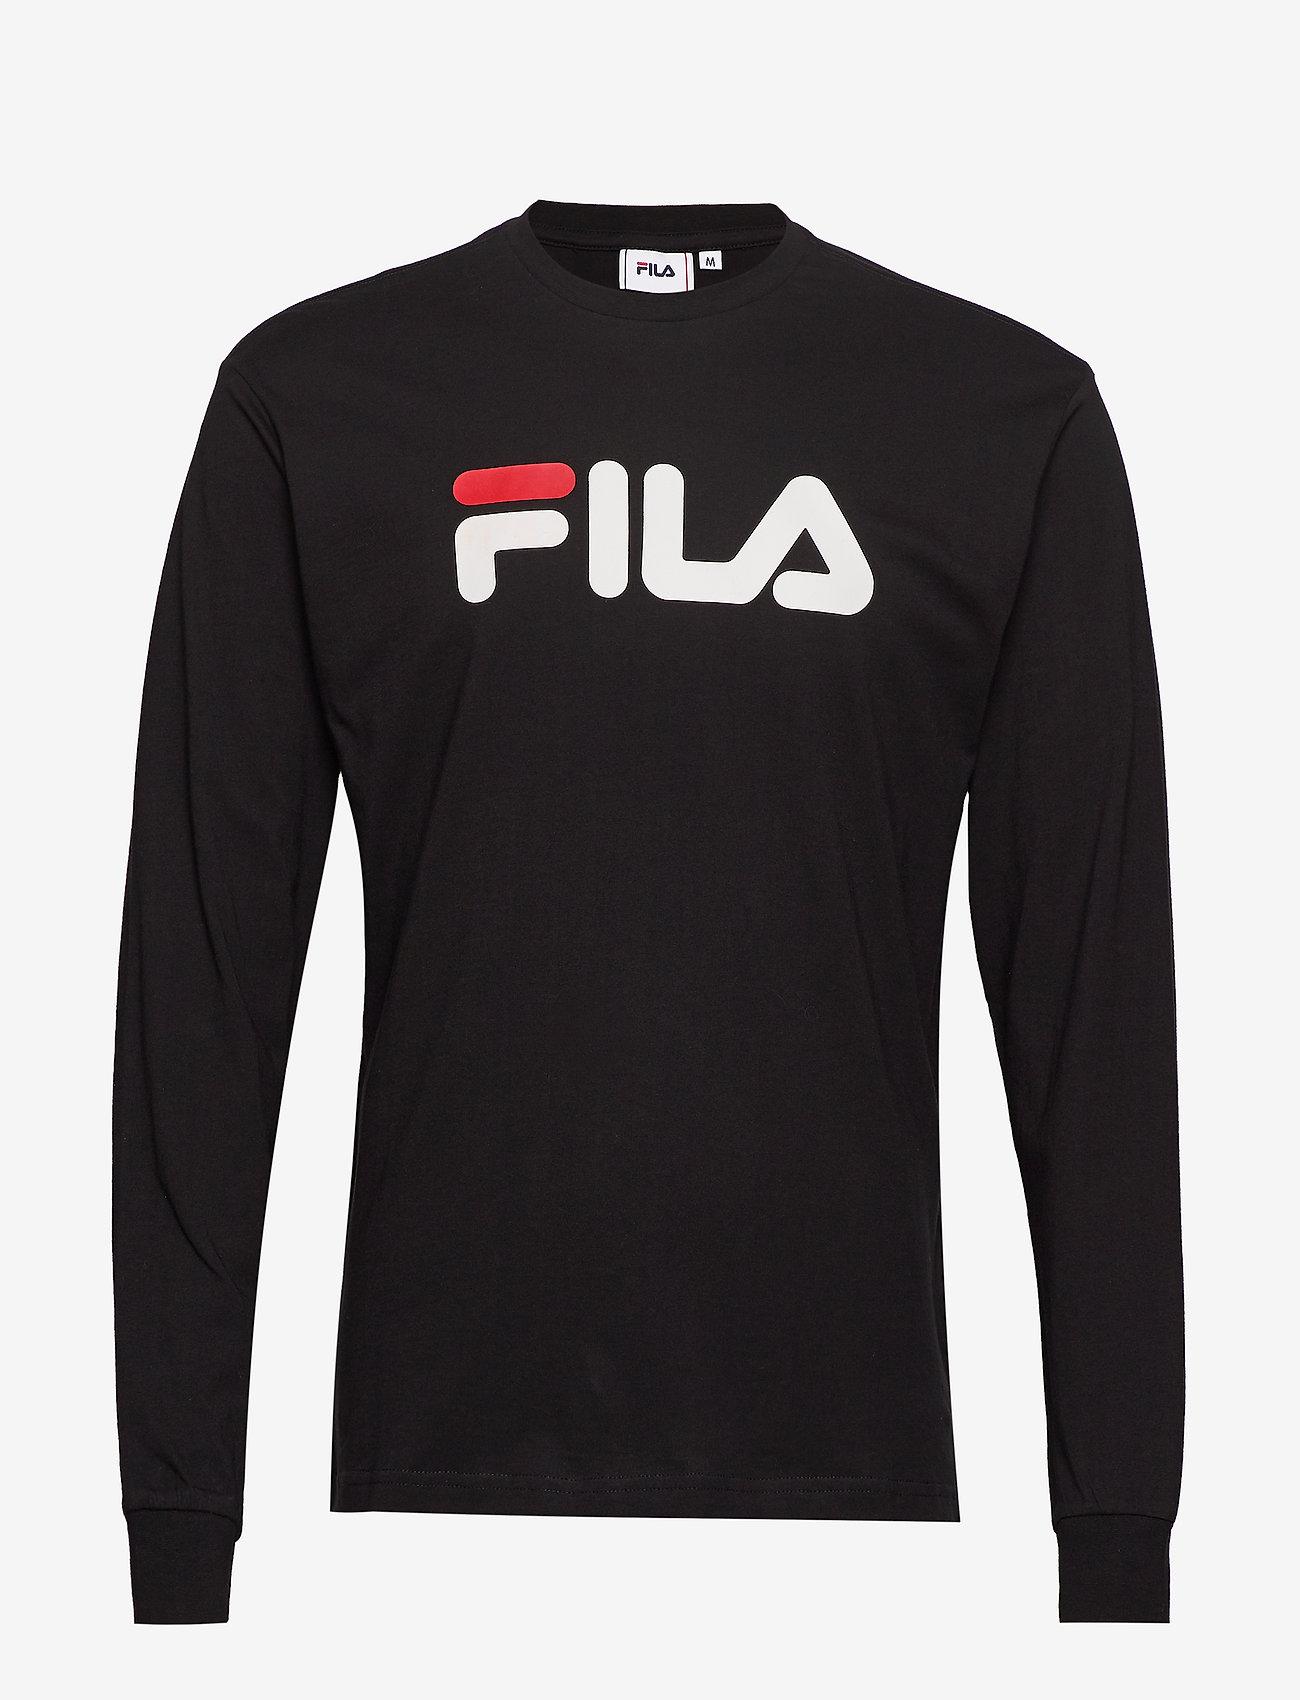 FILA - UNISEX CLASSIC PURE long sleeve shirt - hauts à manches longues - black - 0